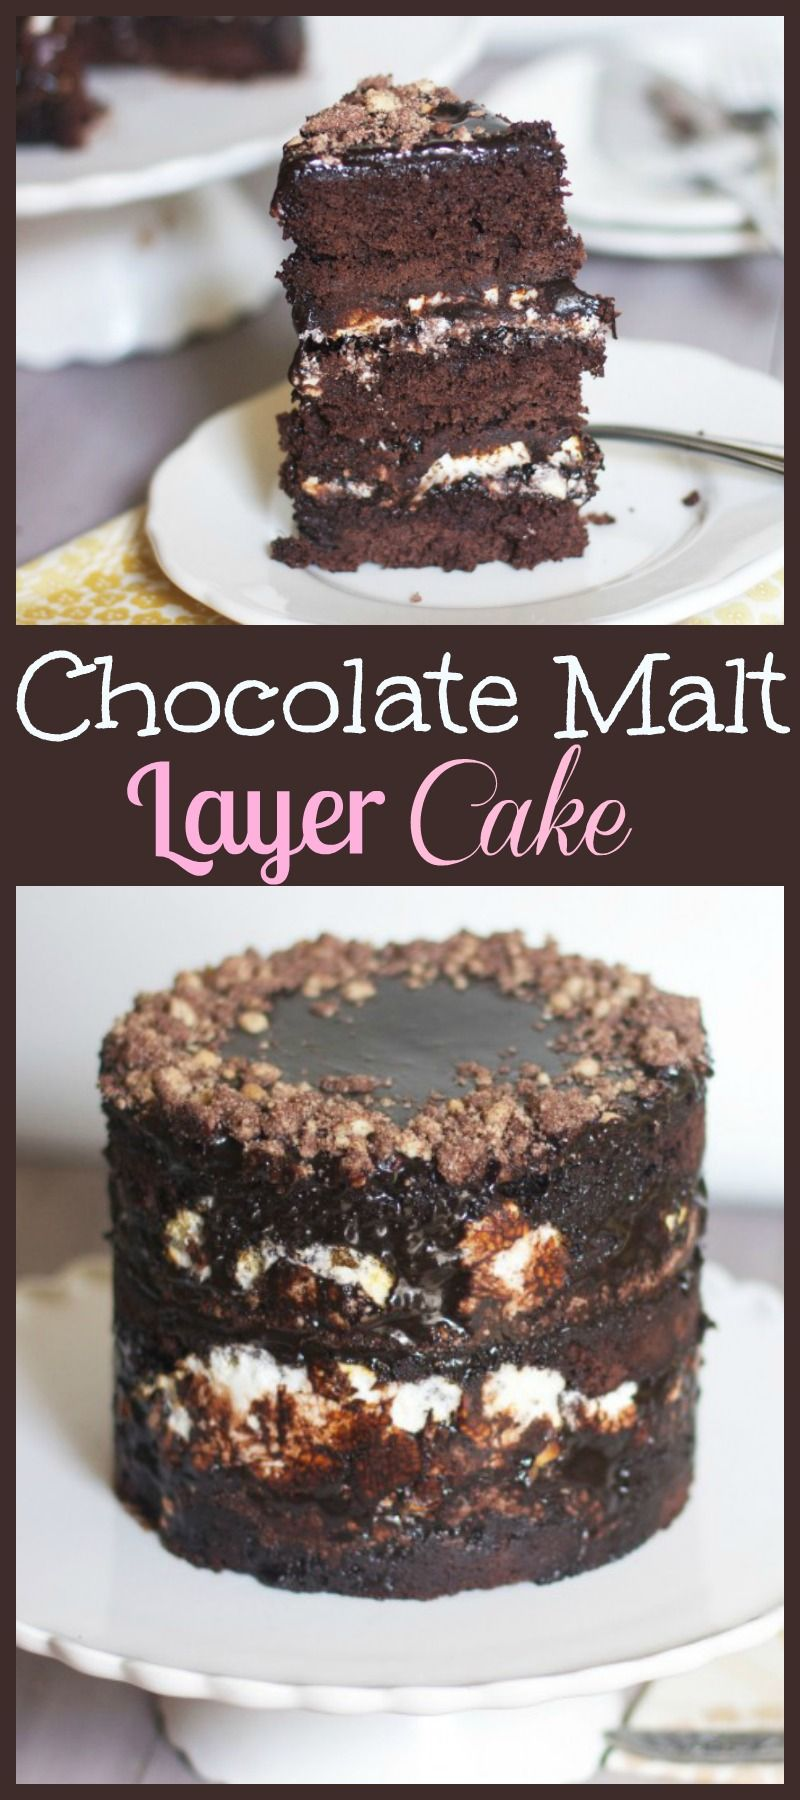 Chocolate Malt Layer Cake Chocolate malt, Cake, Chocolate